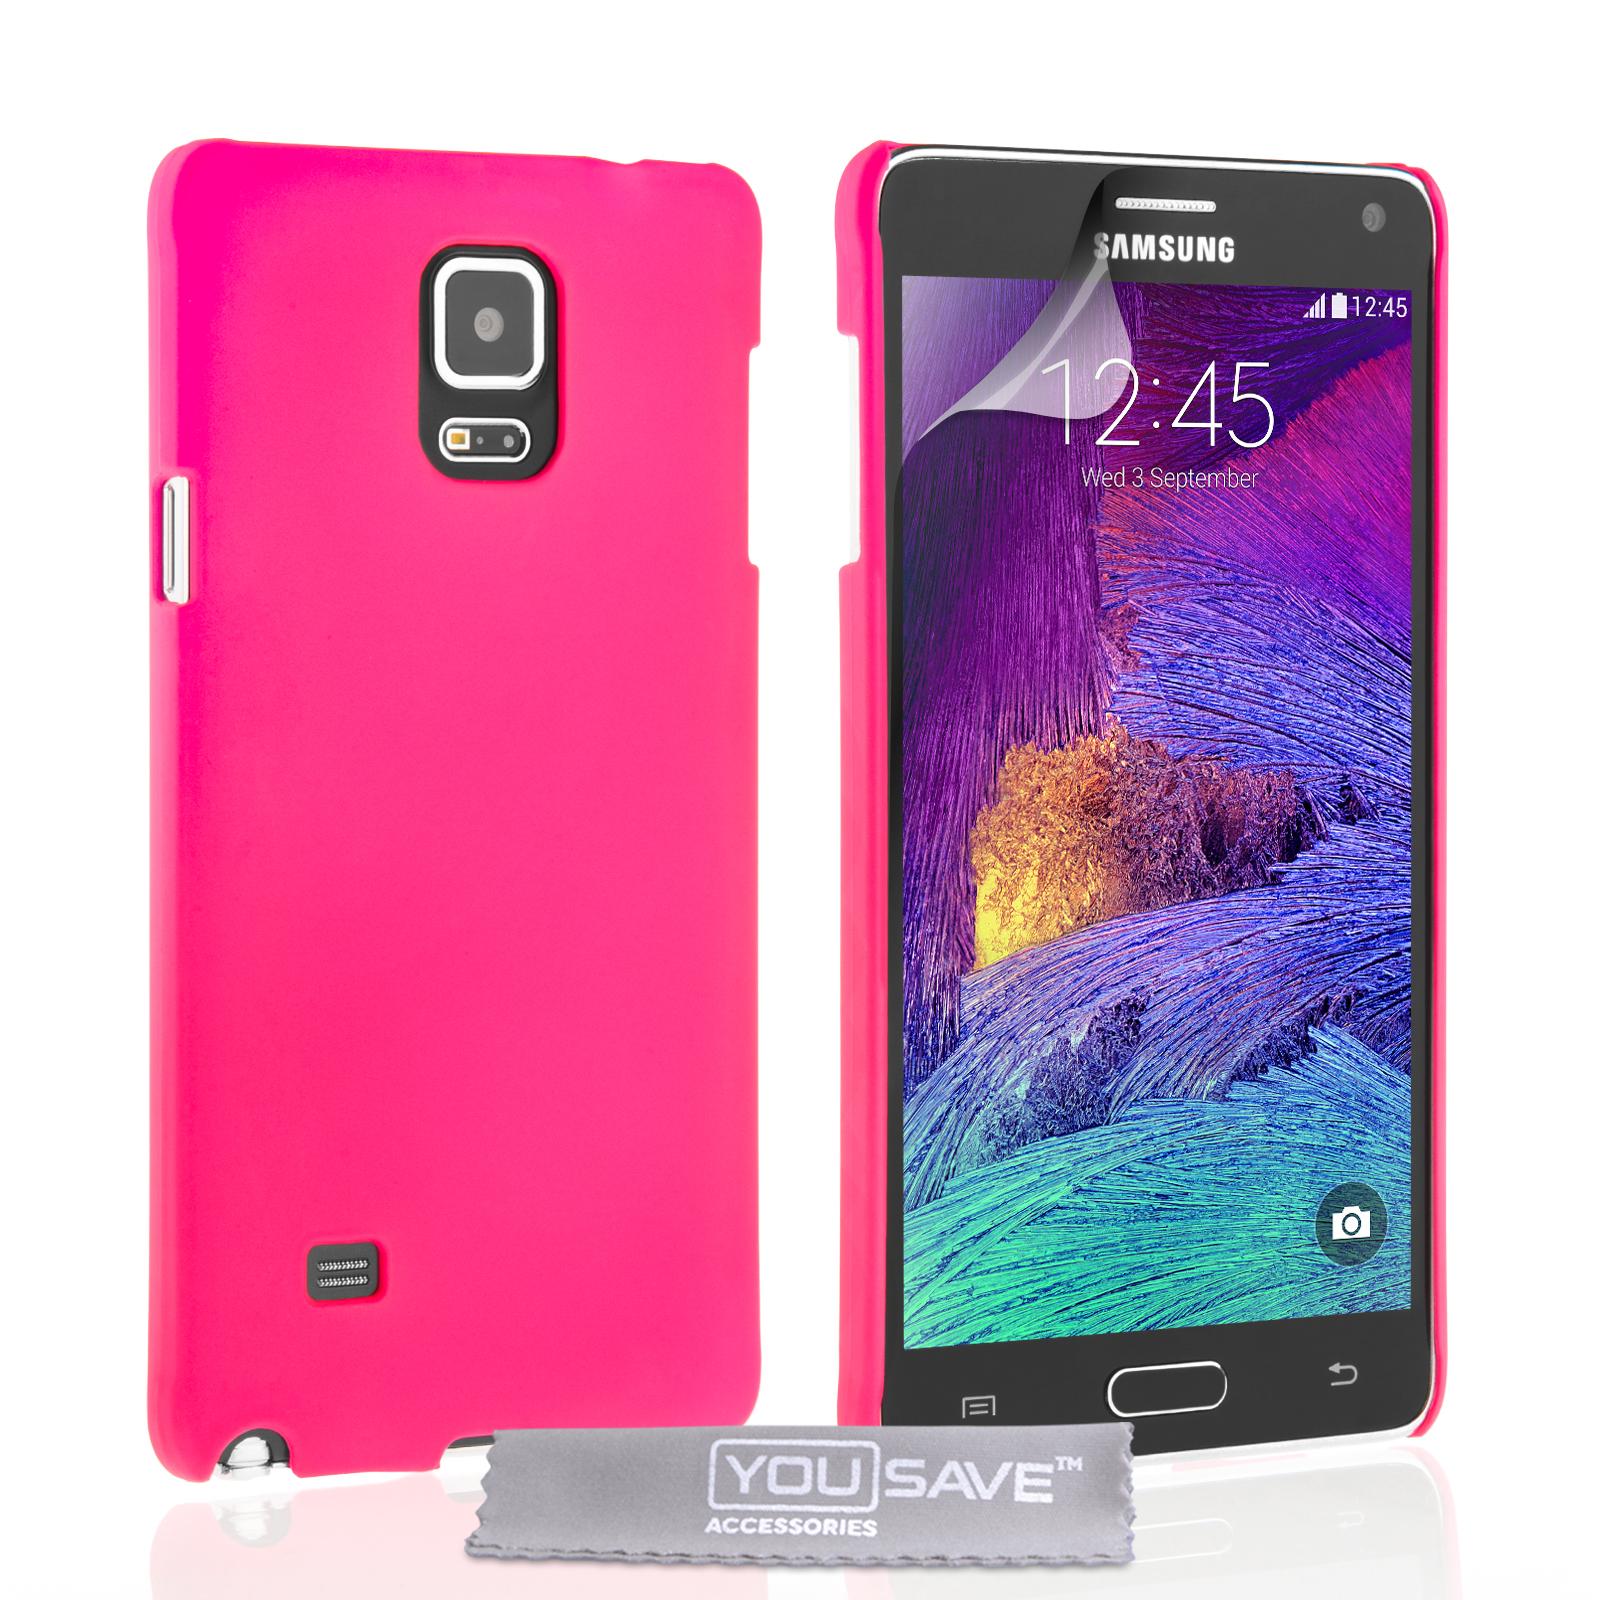 YouSave Σκληρή Θήκη Samsung Galaxy Note 4 (Z978)